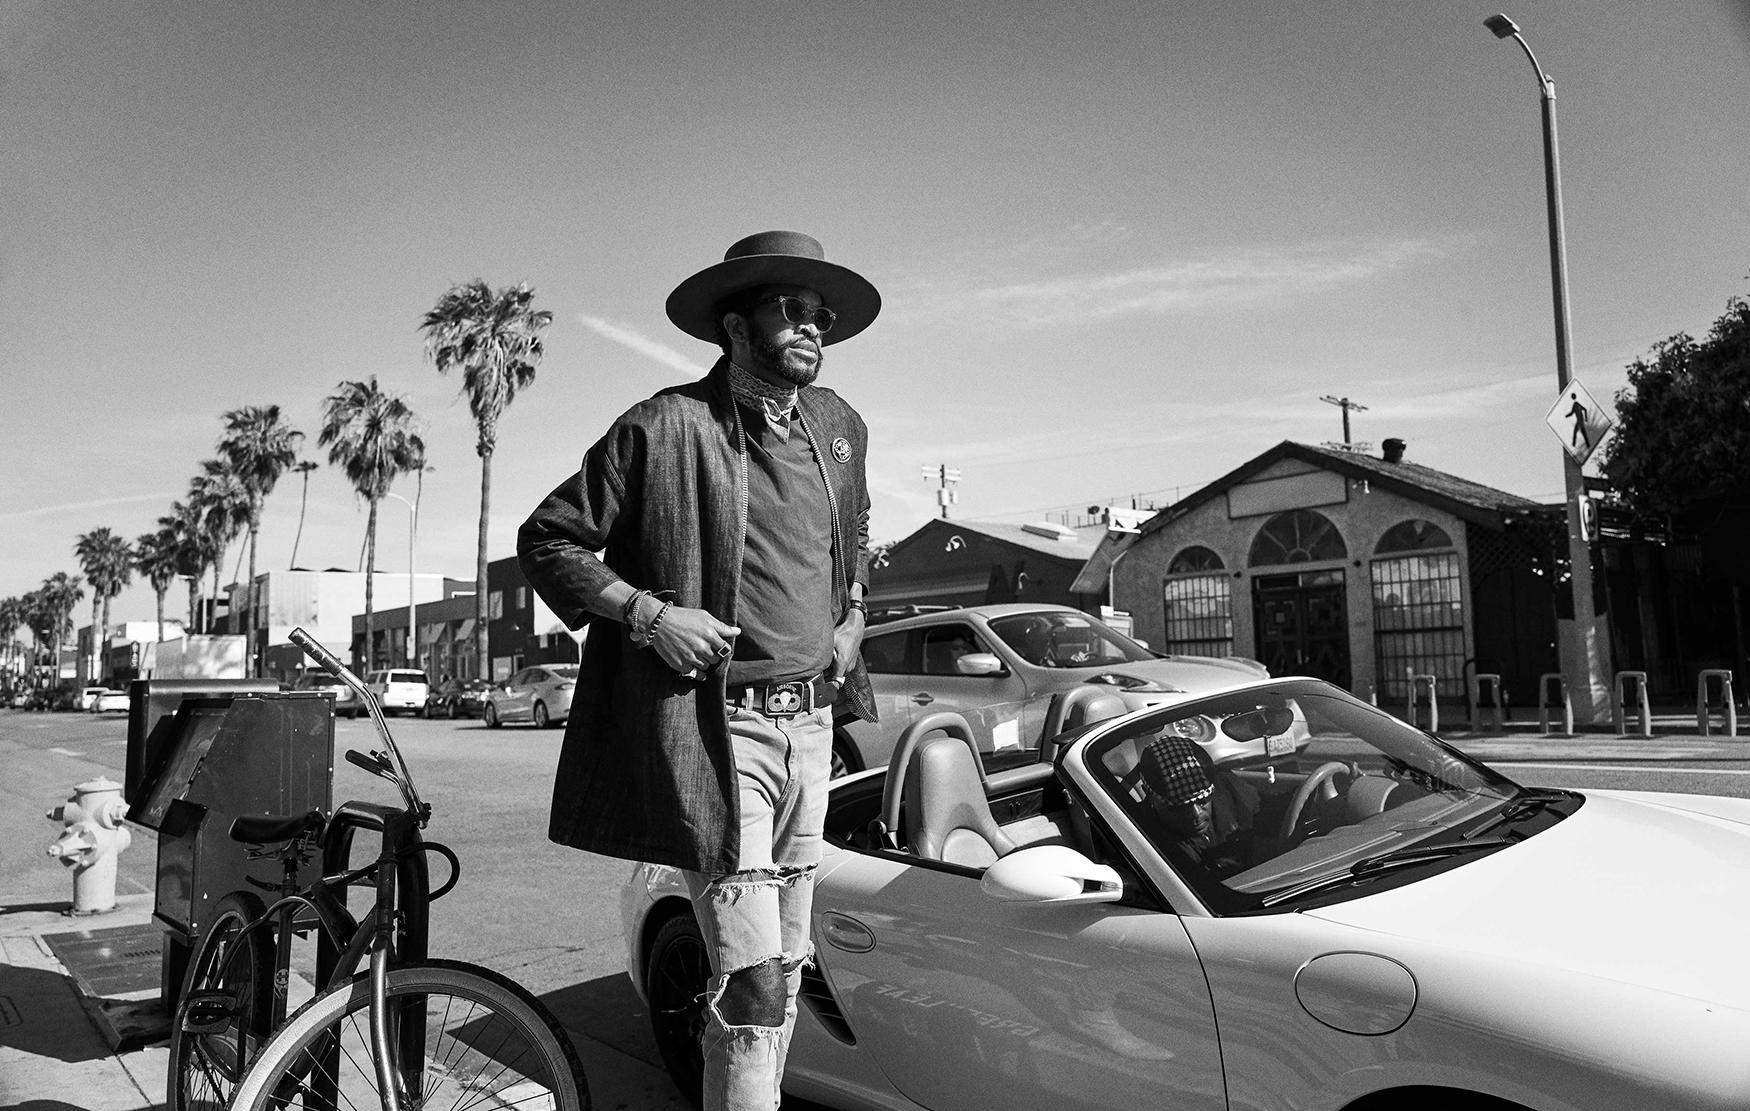 michael-scott-slosar-power-LA-street-story-emmett-skyy-42-2018-016.jpg